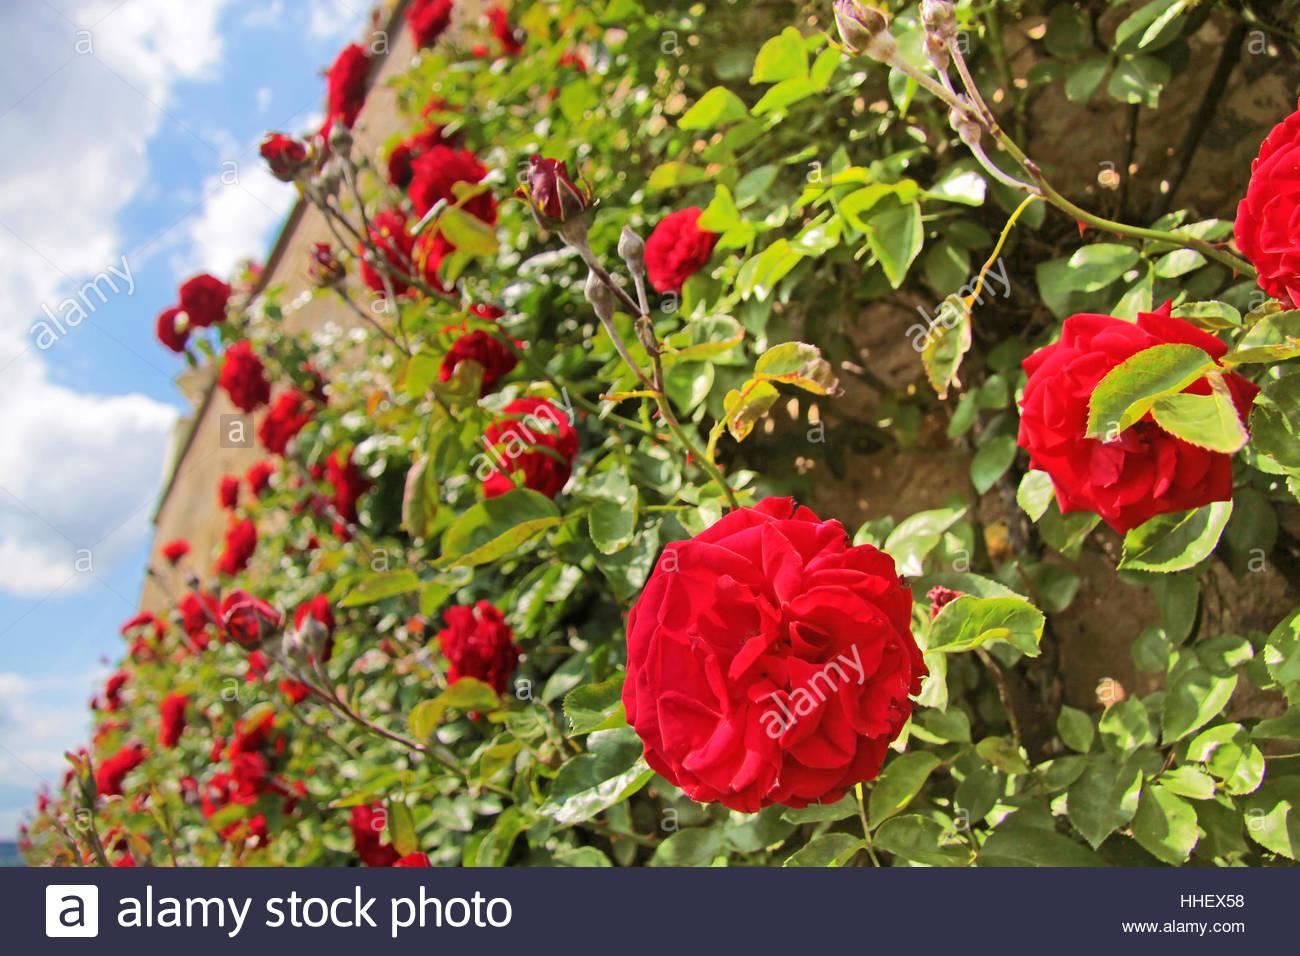 blume rose pflanze rosen wand rosenstrauch rot alte garten blume pflanze stockfoto. Black Bedroom Furniture Sets. Home Design Ideas